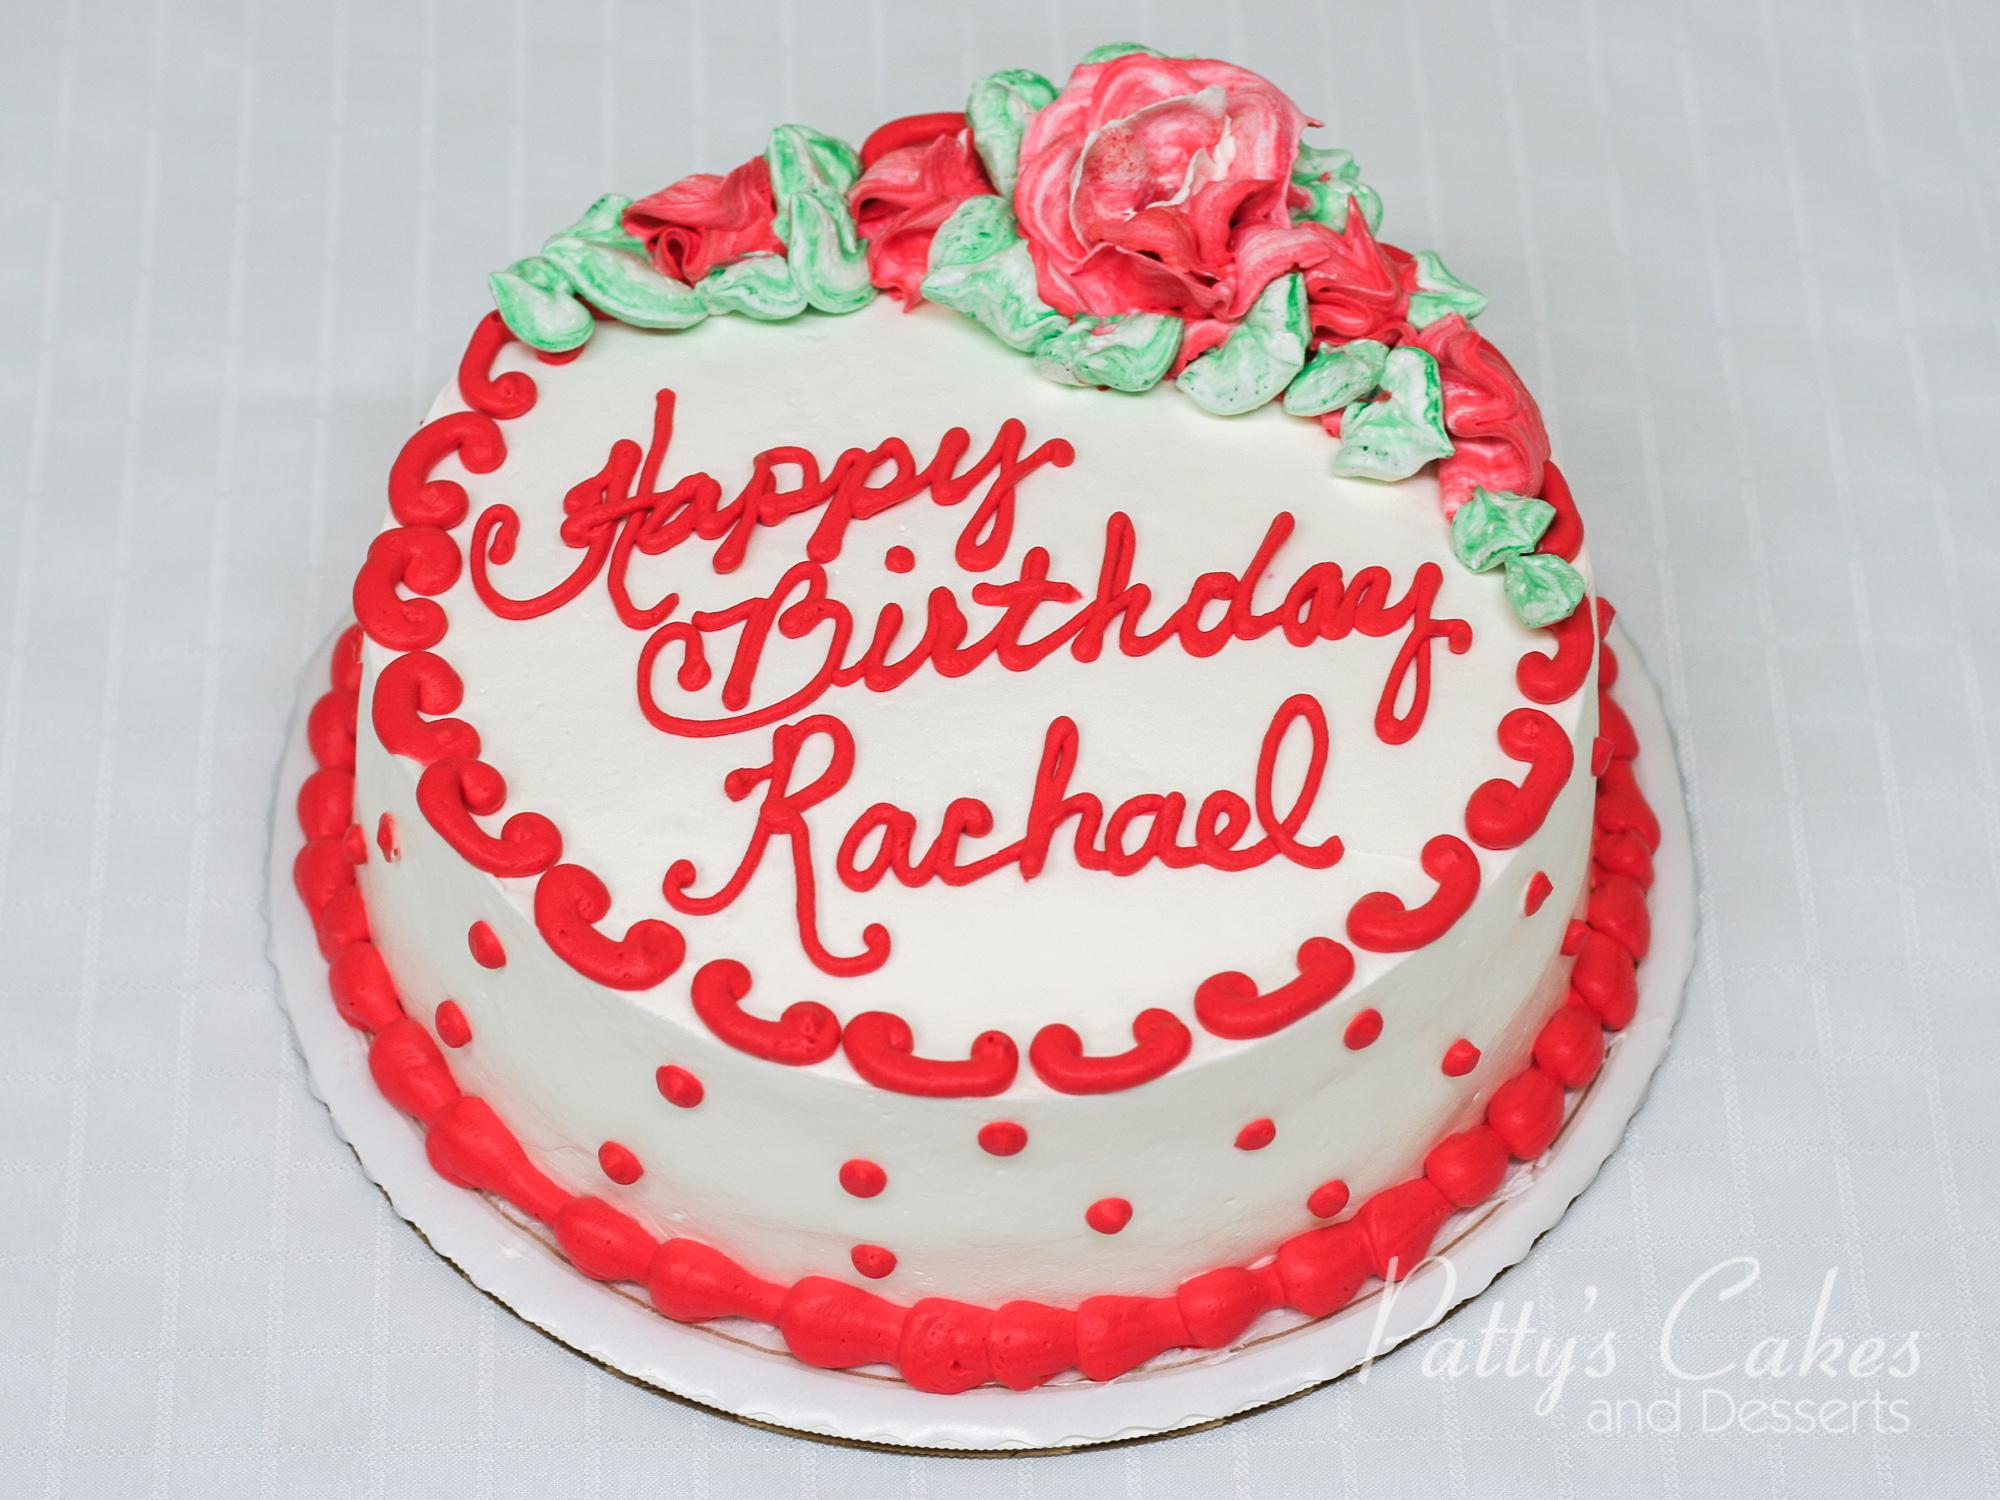 Green And White Birthday Cake Designs